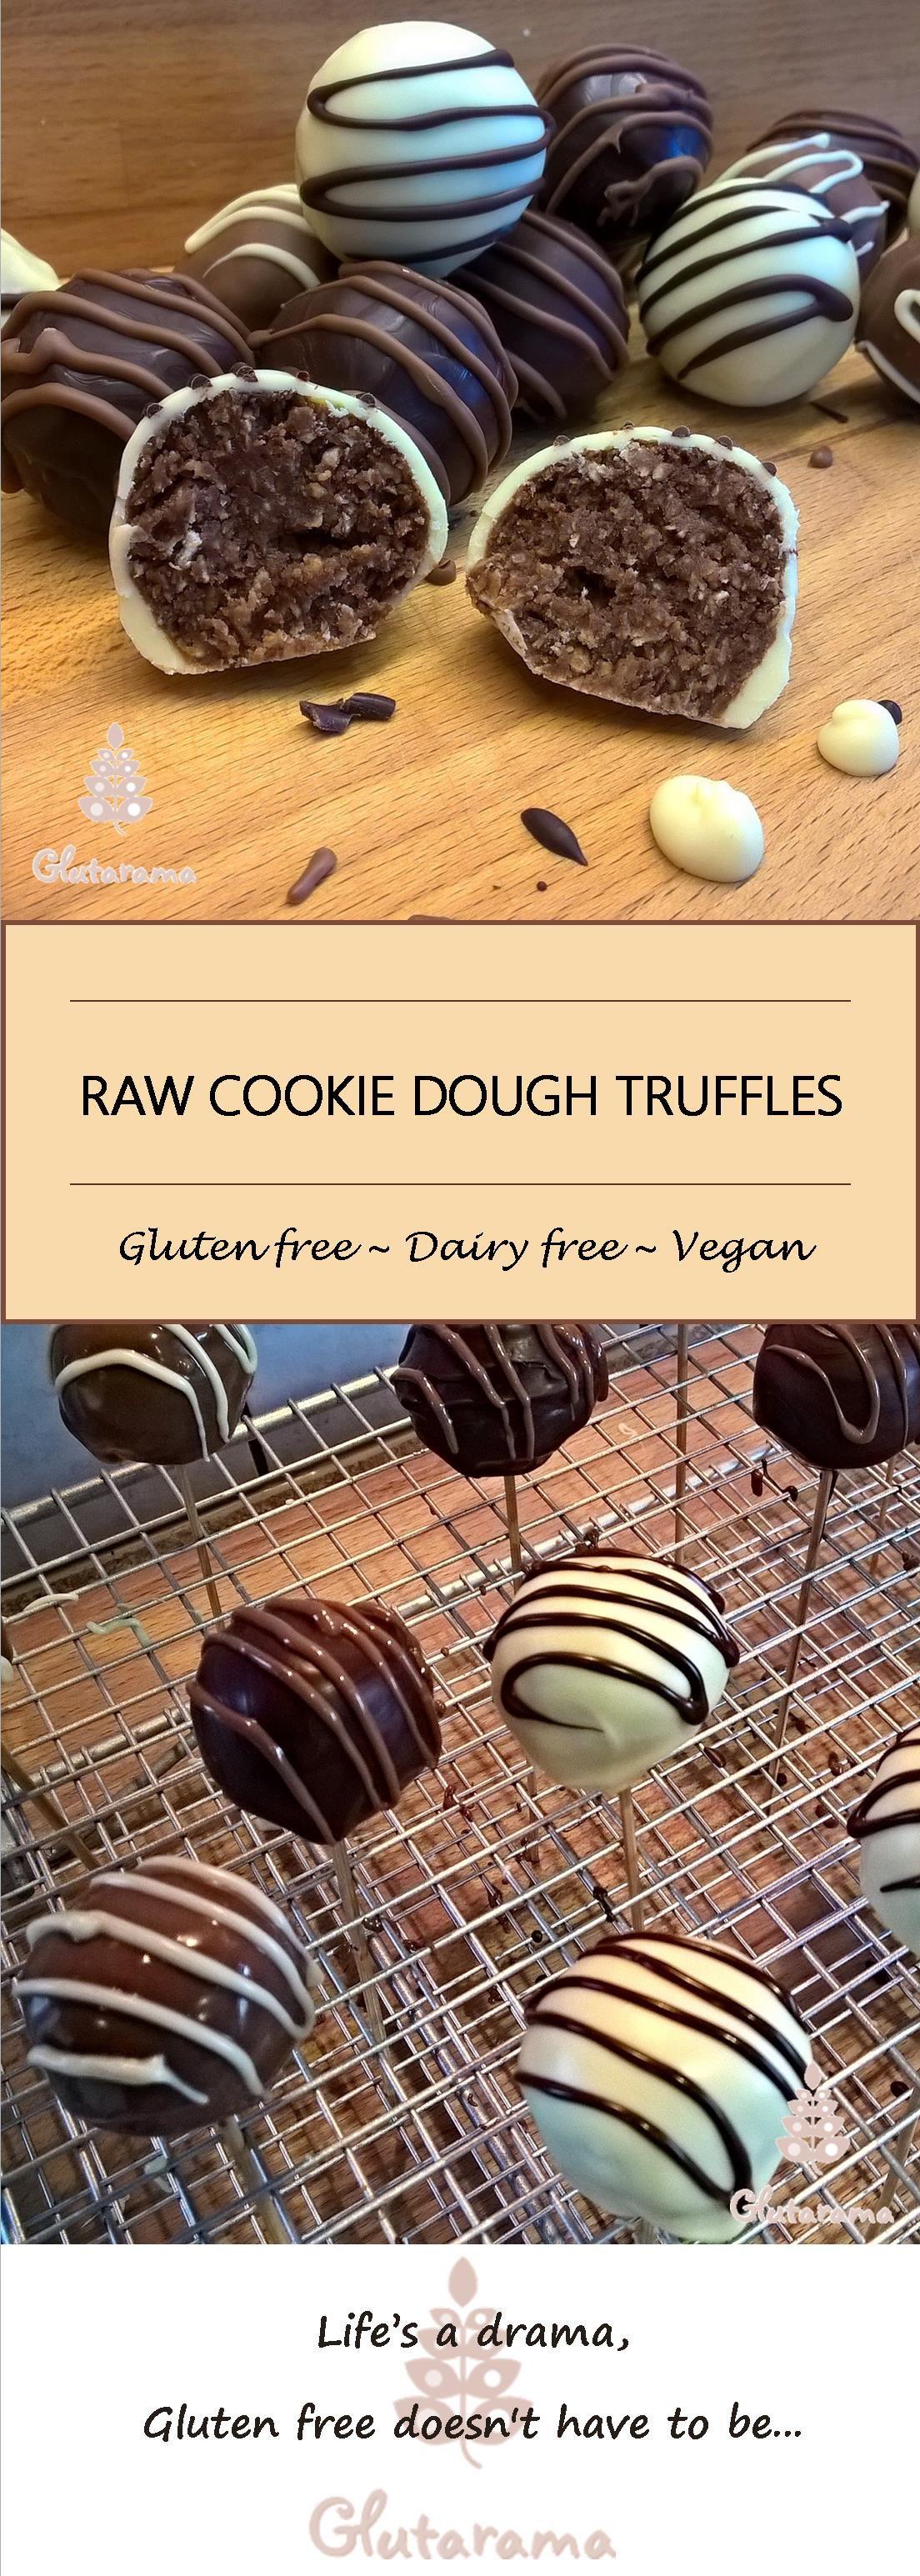 Gluten Free Raw Truffles (Cake Pops) Recipe Dairy free